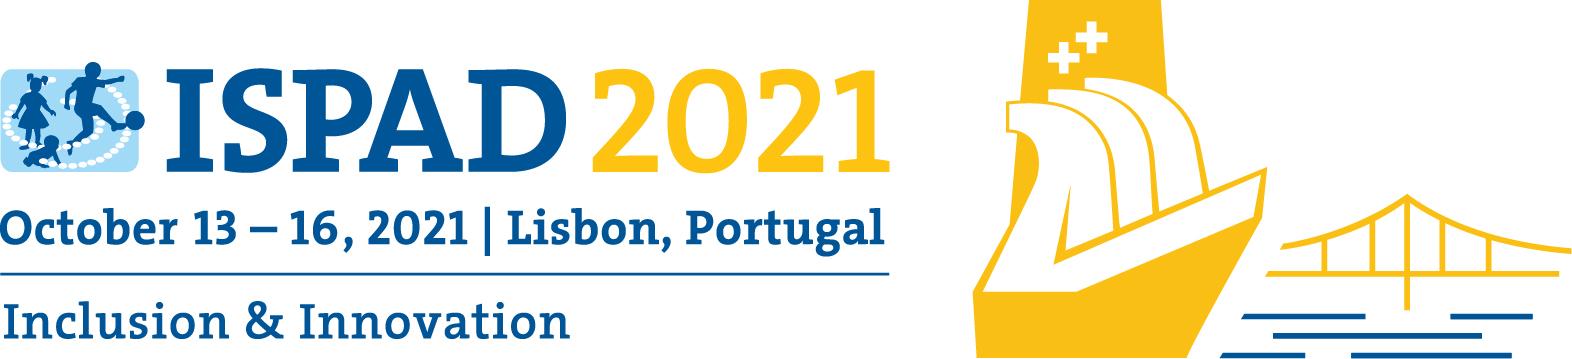 ISPAD 2021